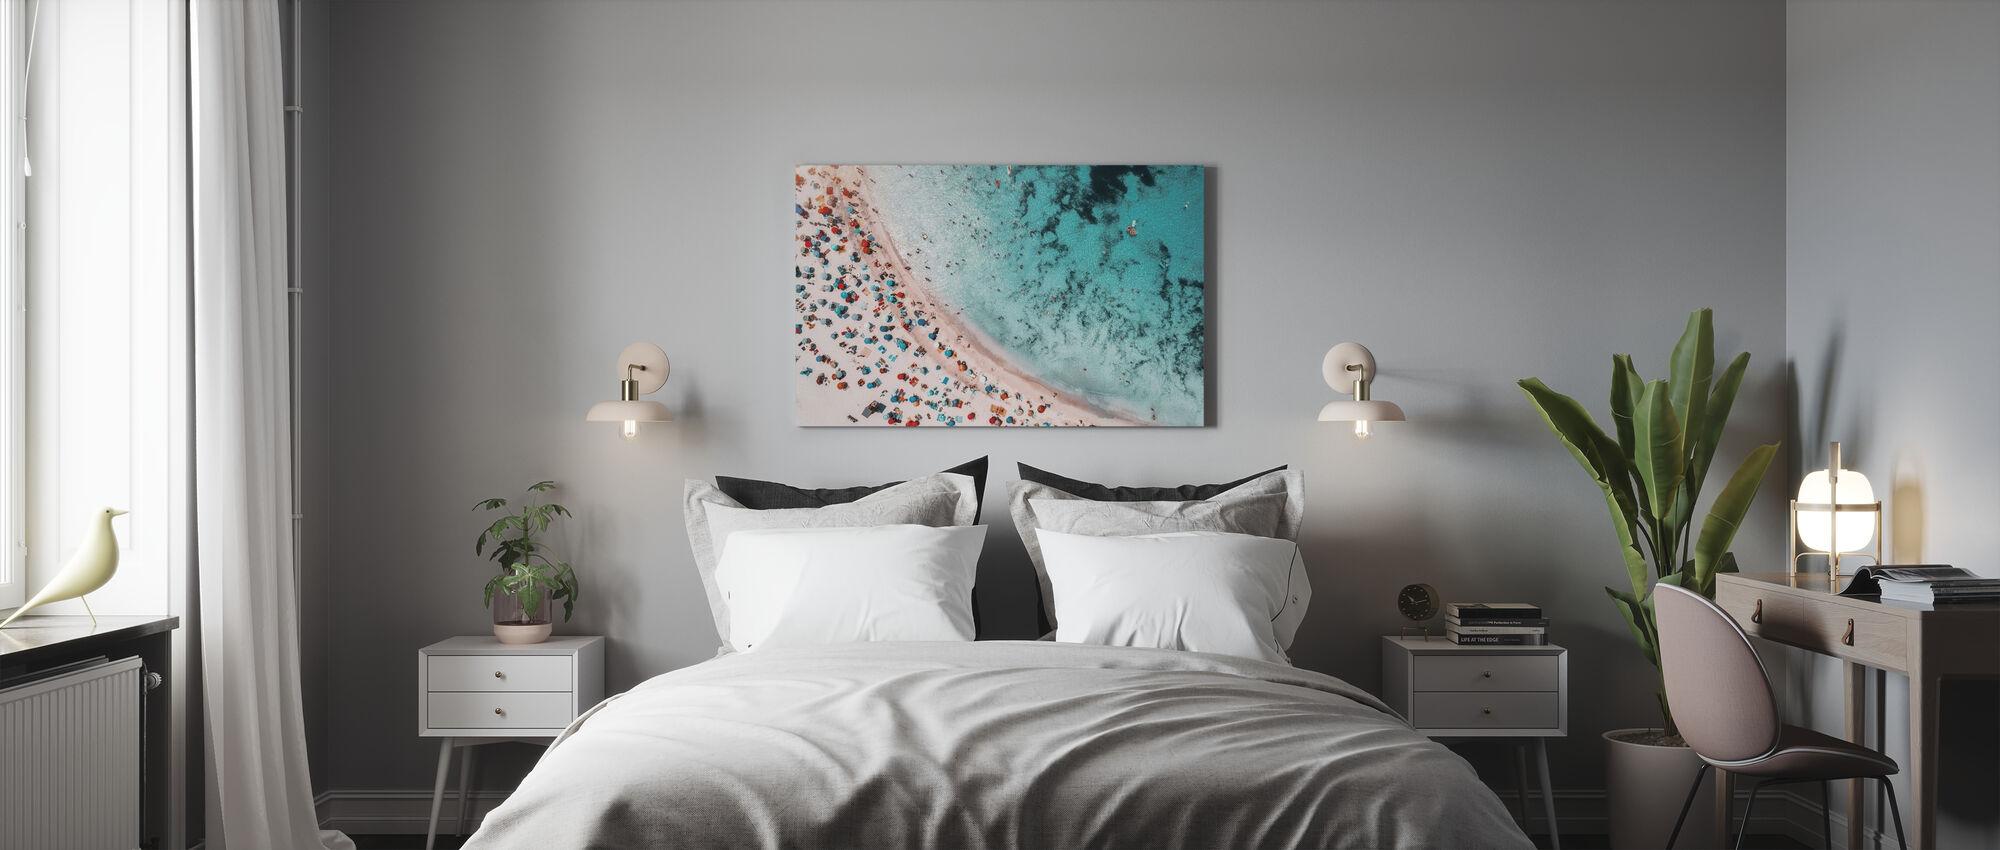 Coasting Along - Canvas print - Bedroom